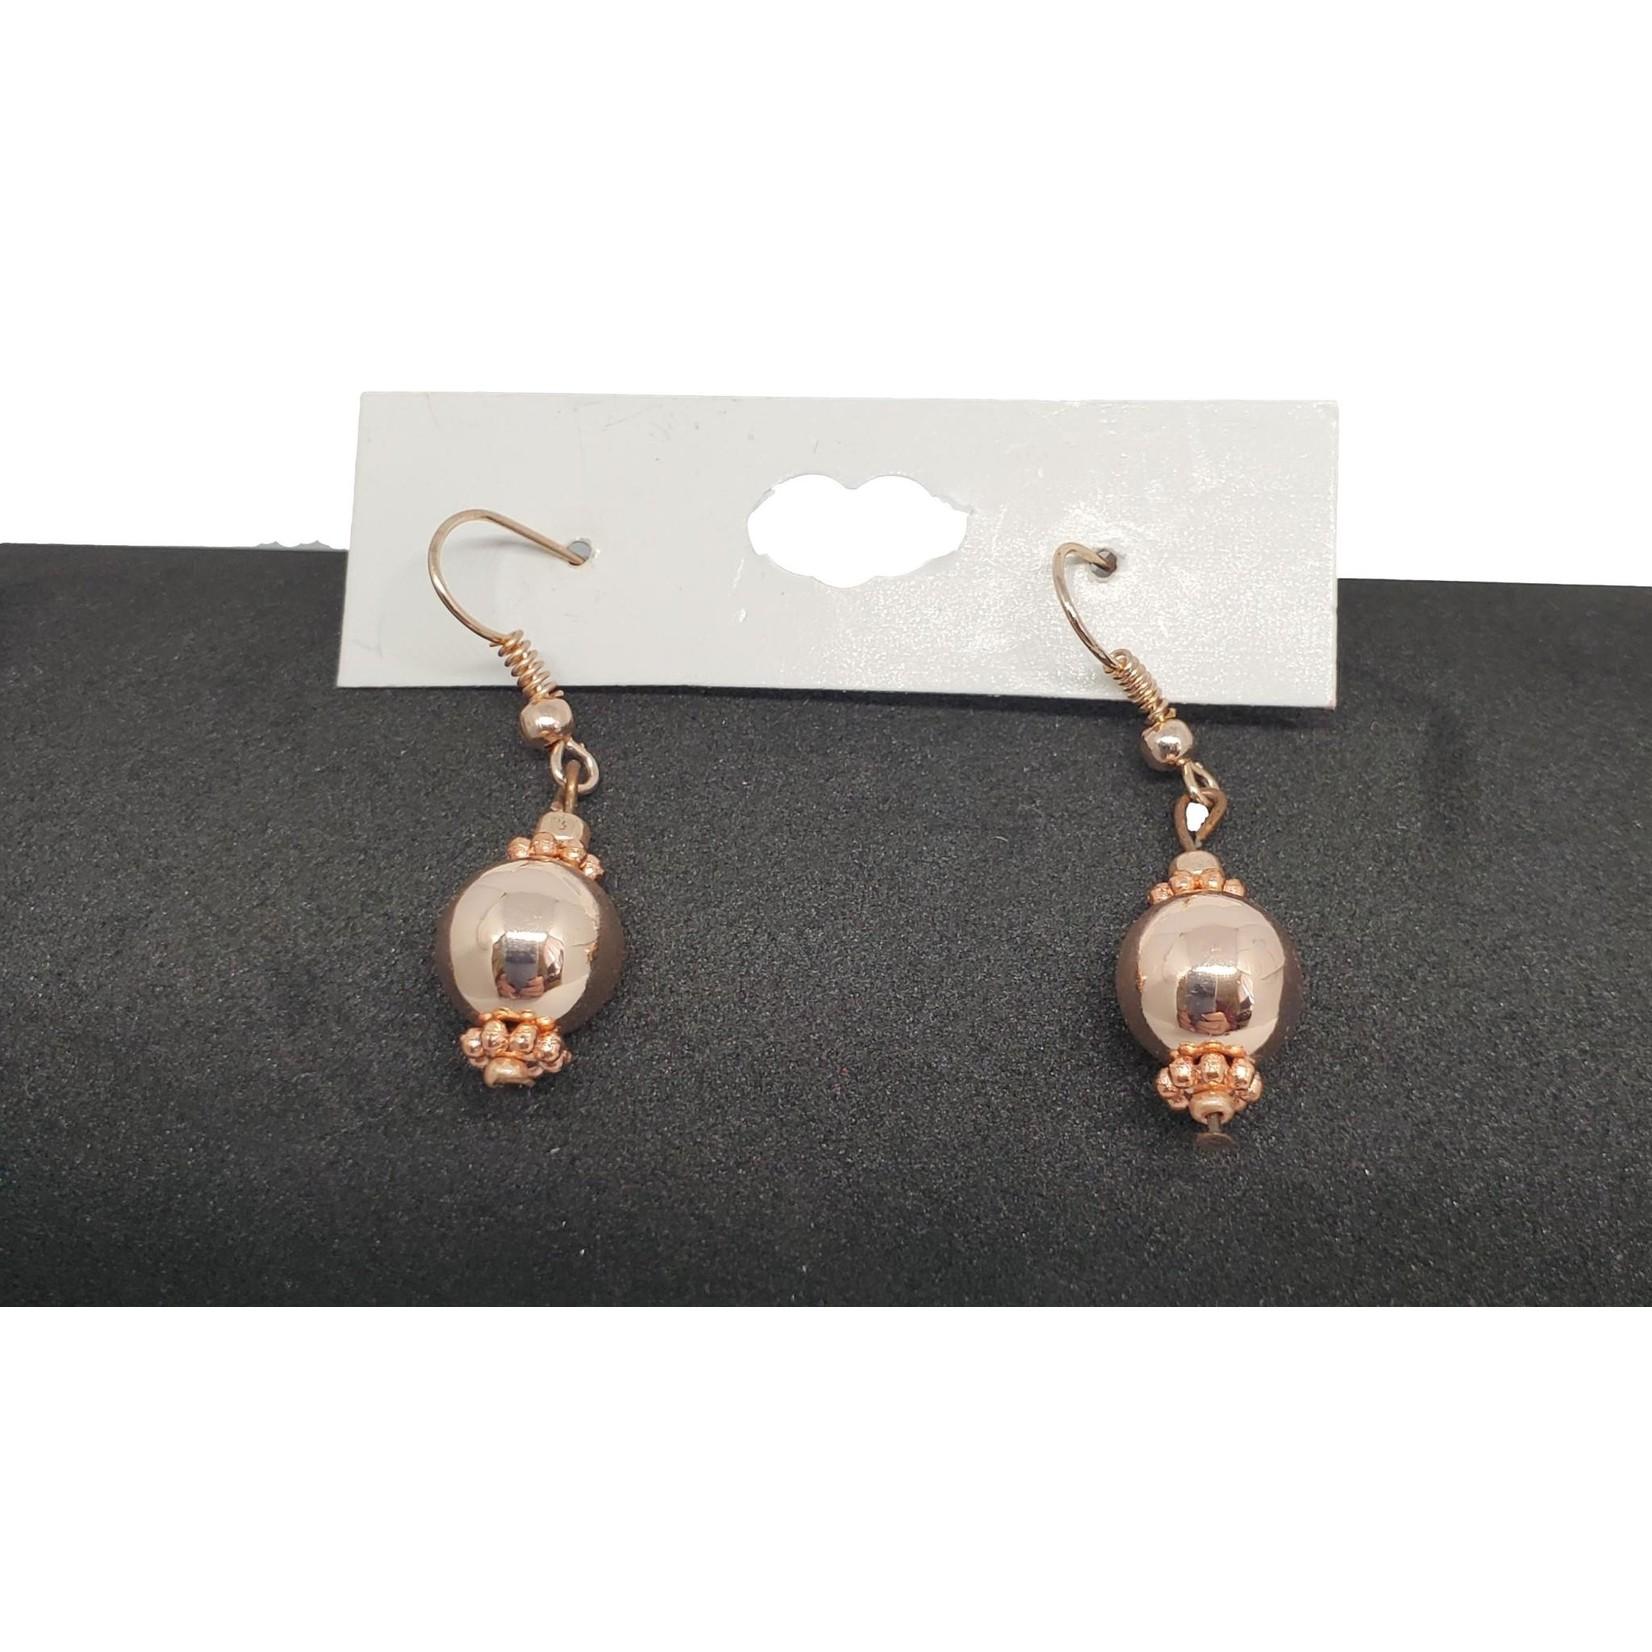 Jewellery by Deborah Young-Groves Rose Gold Drop Bead Earrings